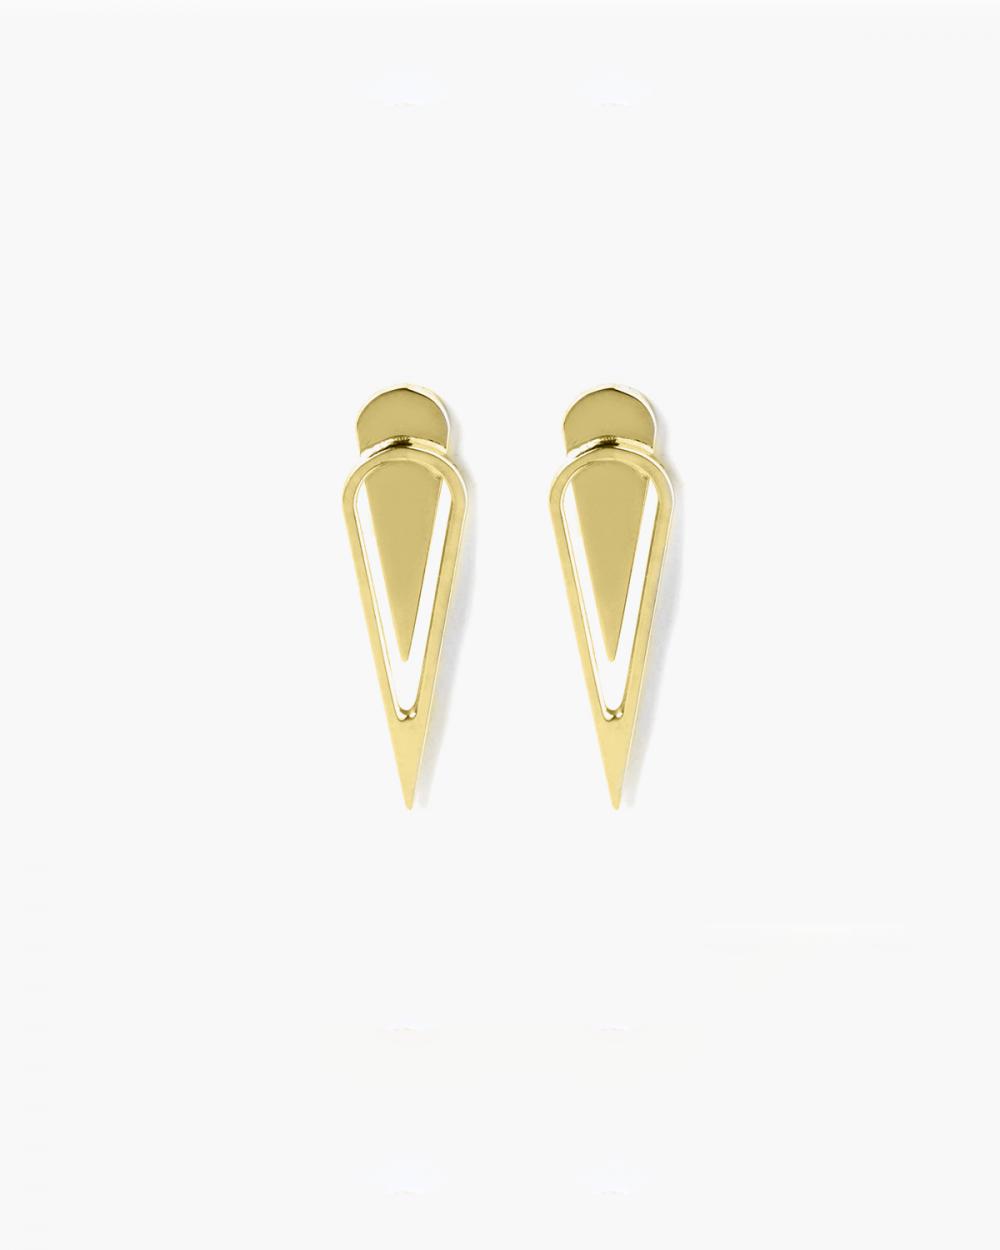 Earrings YELLOW GOLD DROP BIG EARRINGS NOVE25